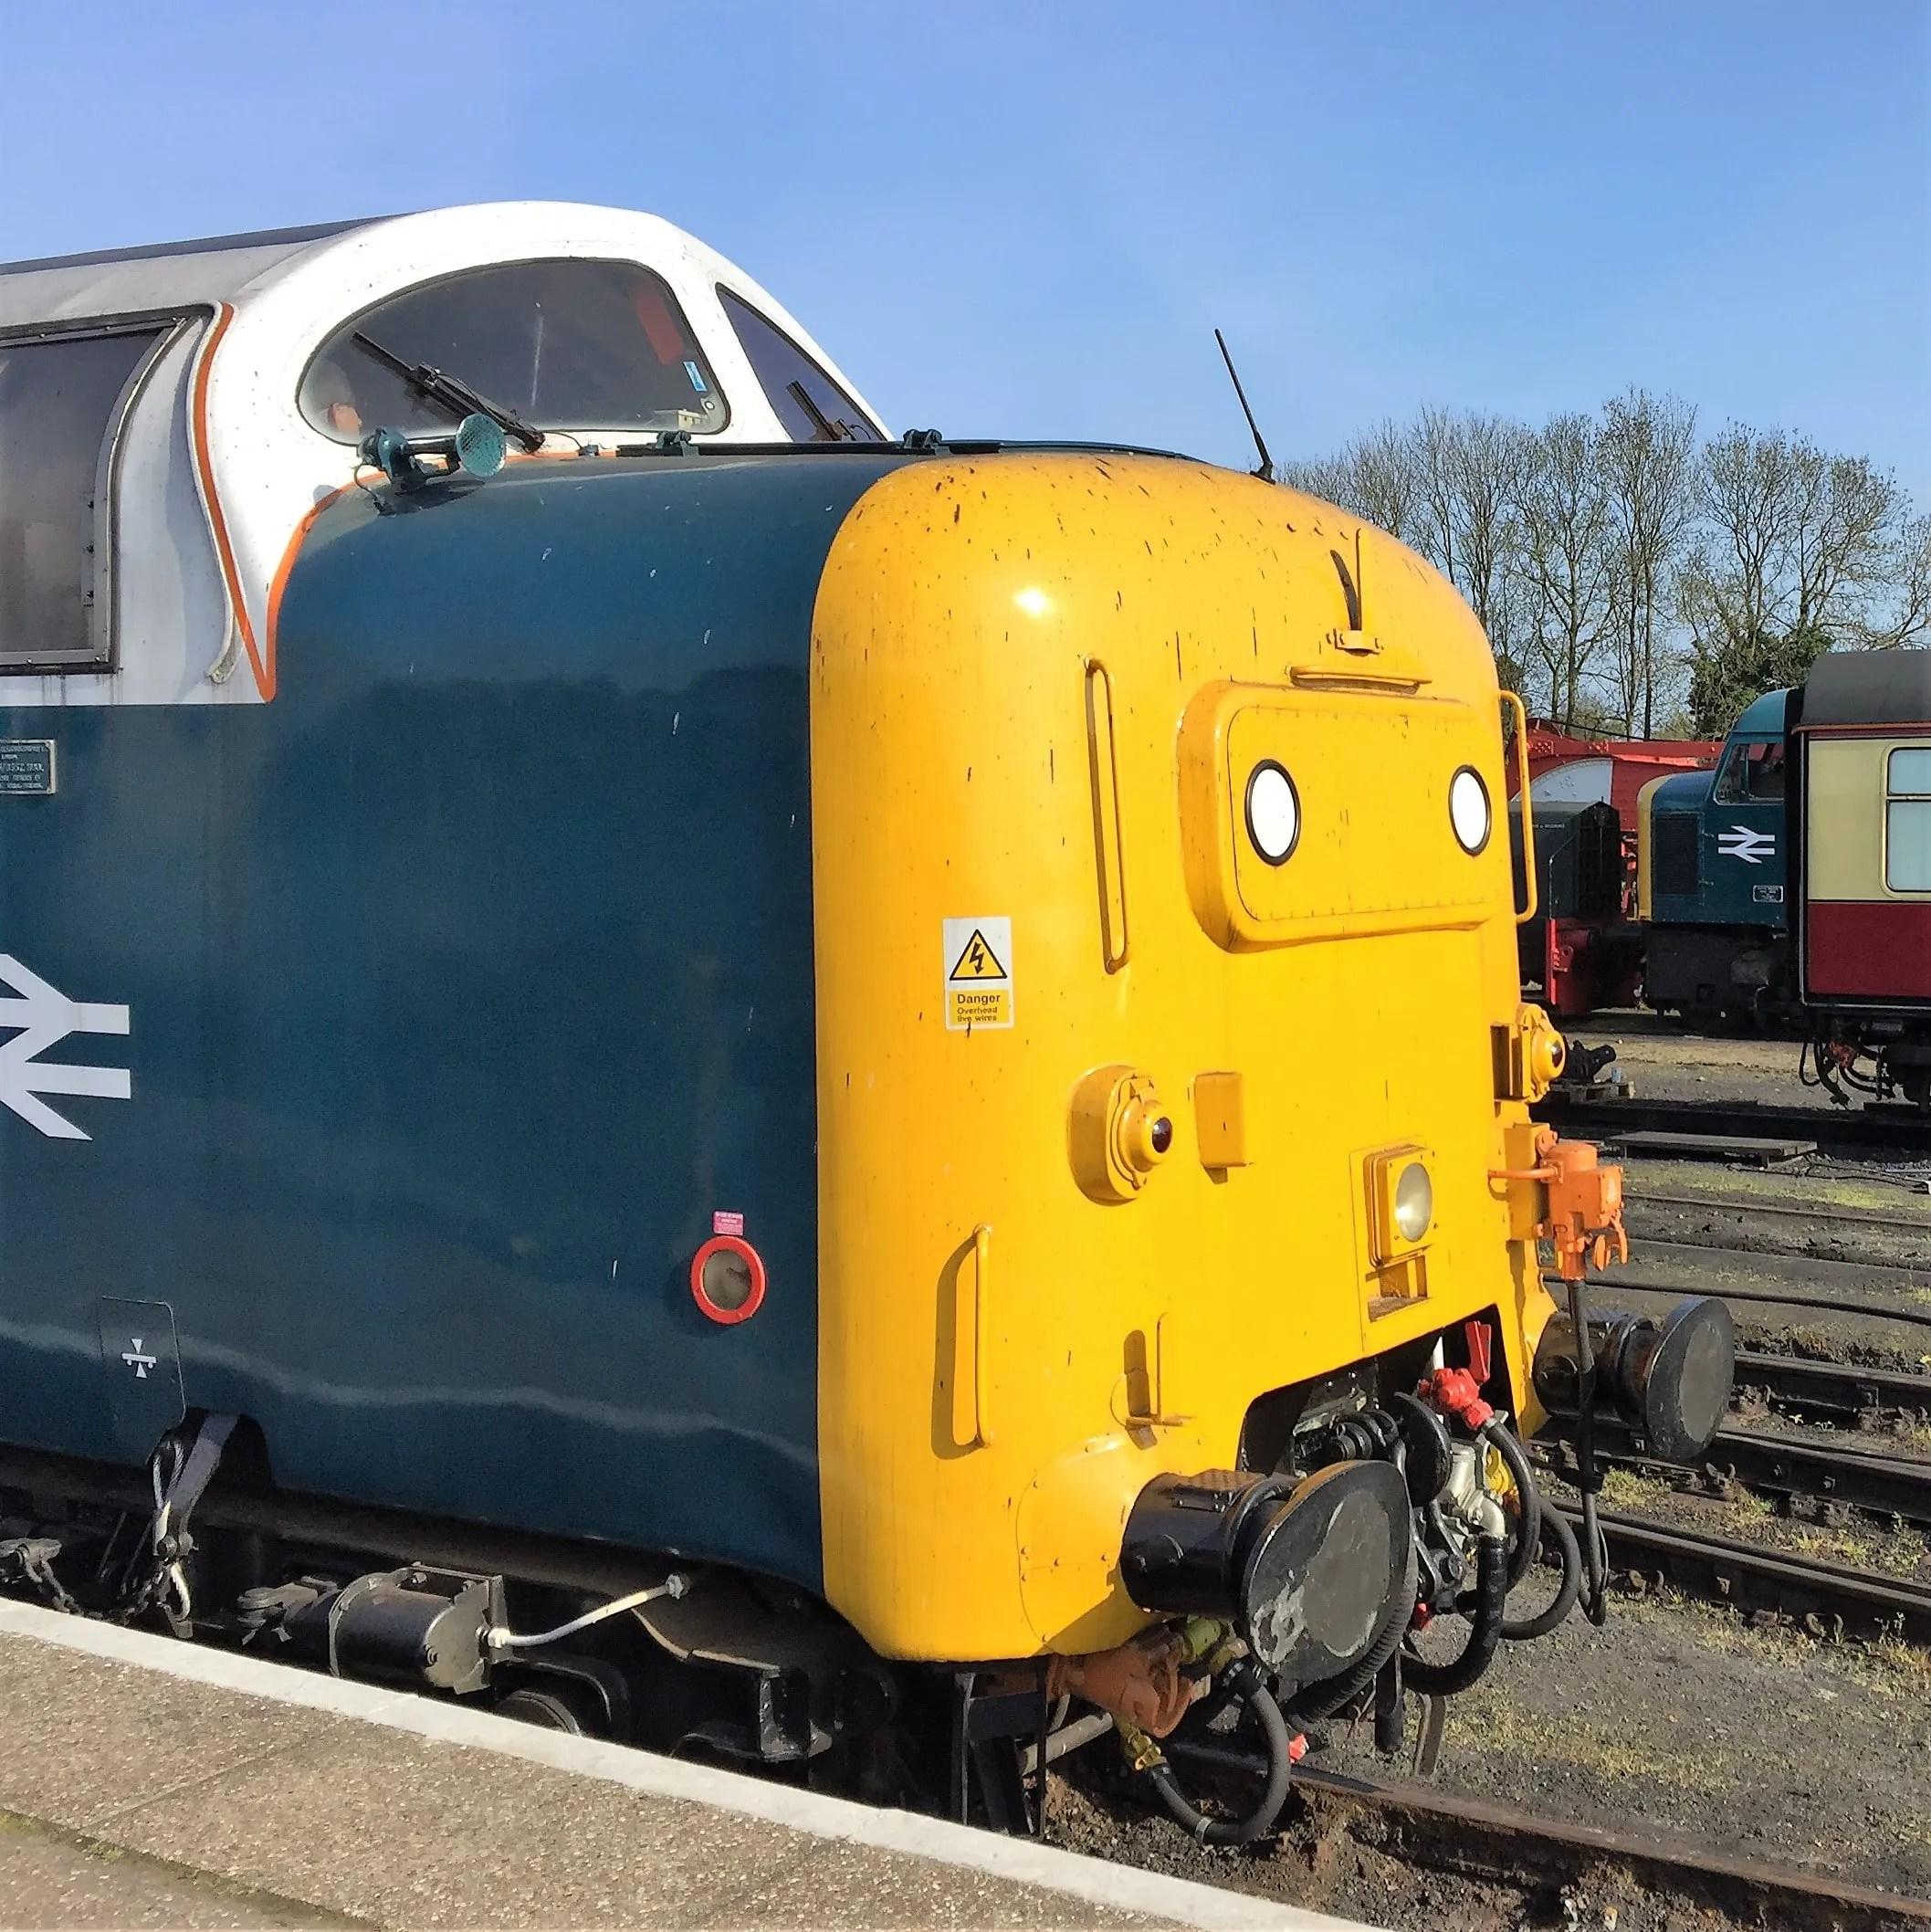 Deltic locomotive